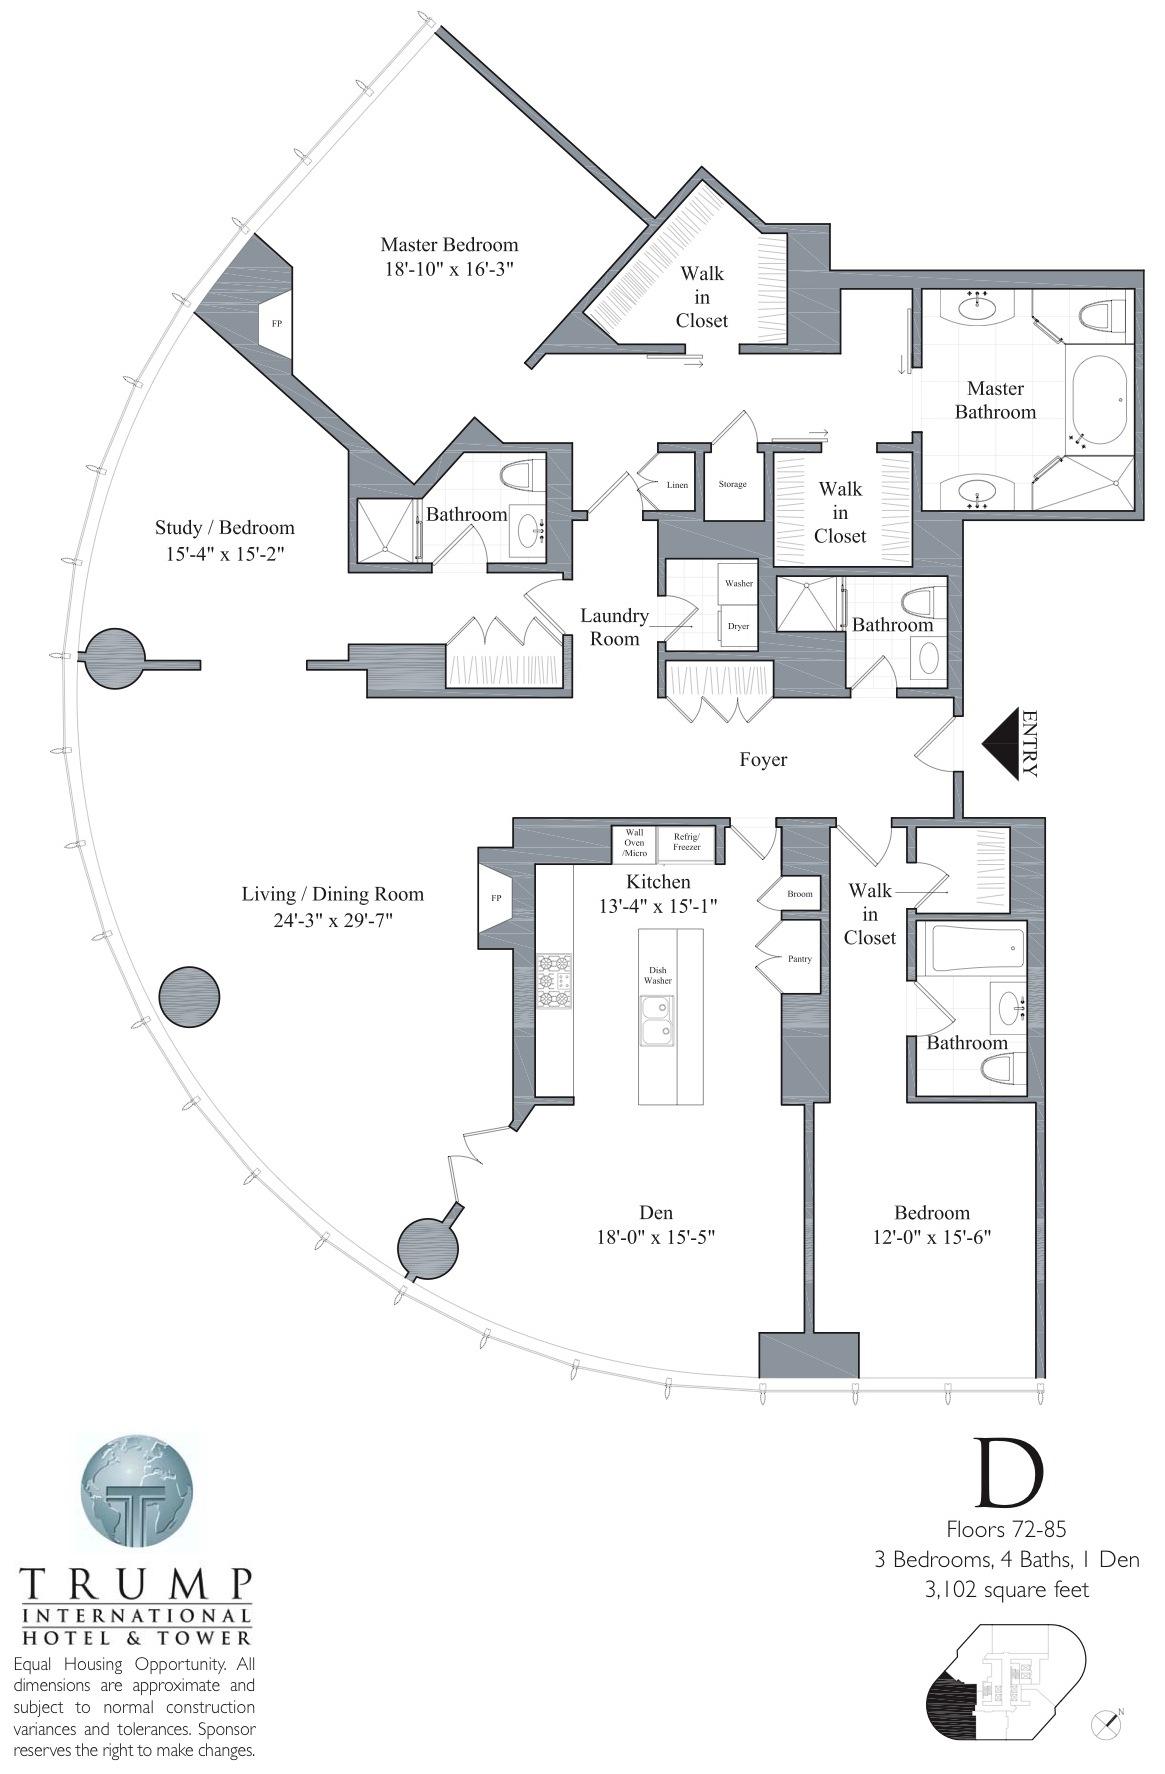 72 85D trump tower chicago, 401 n wabash, floor plans, views,Trumps Housing Plan